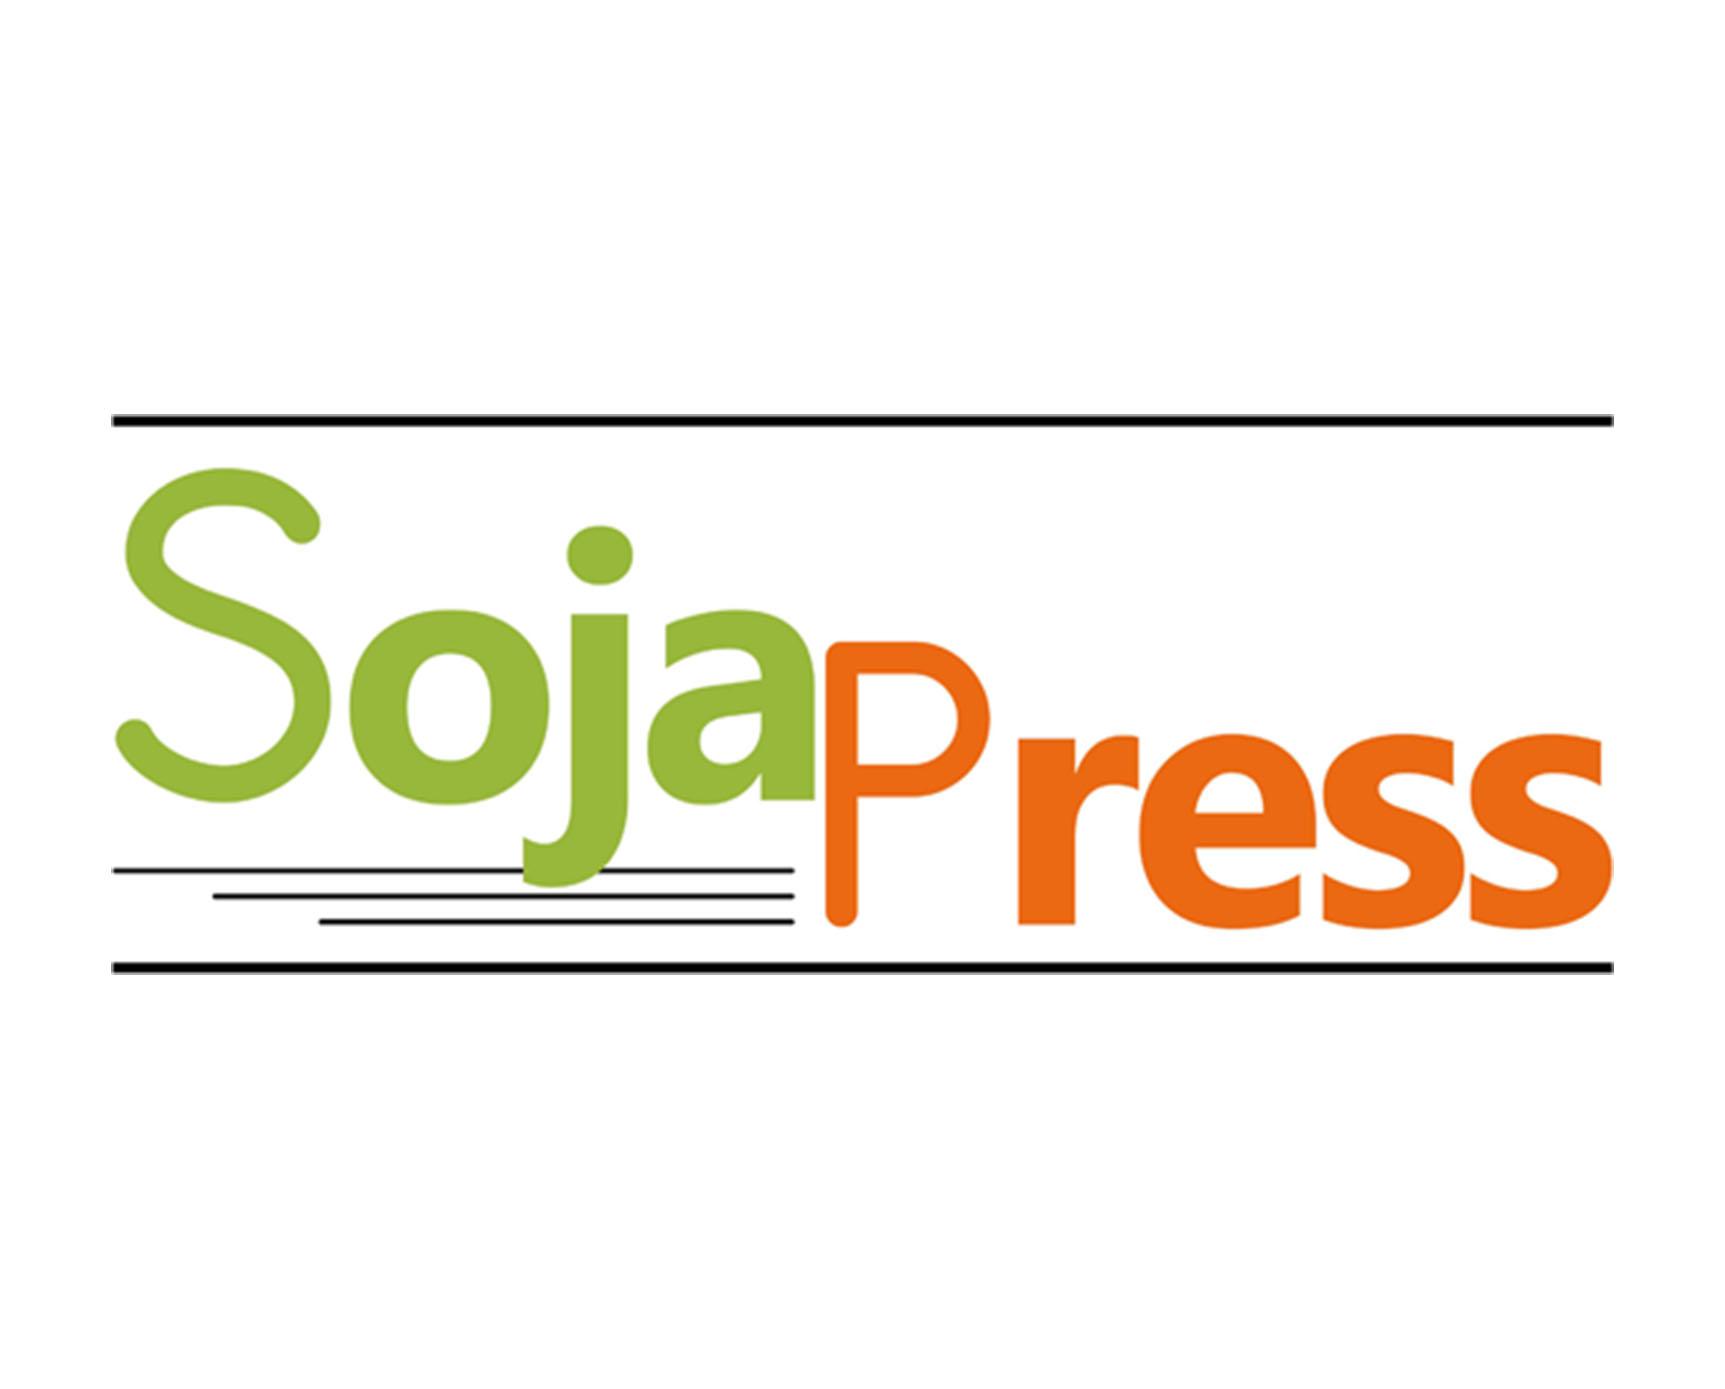 Soja Press, usine de soja bio ou non OGM Terres du Sud